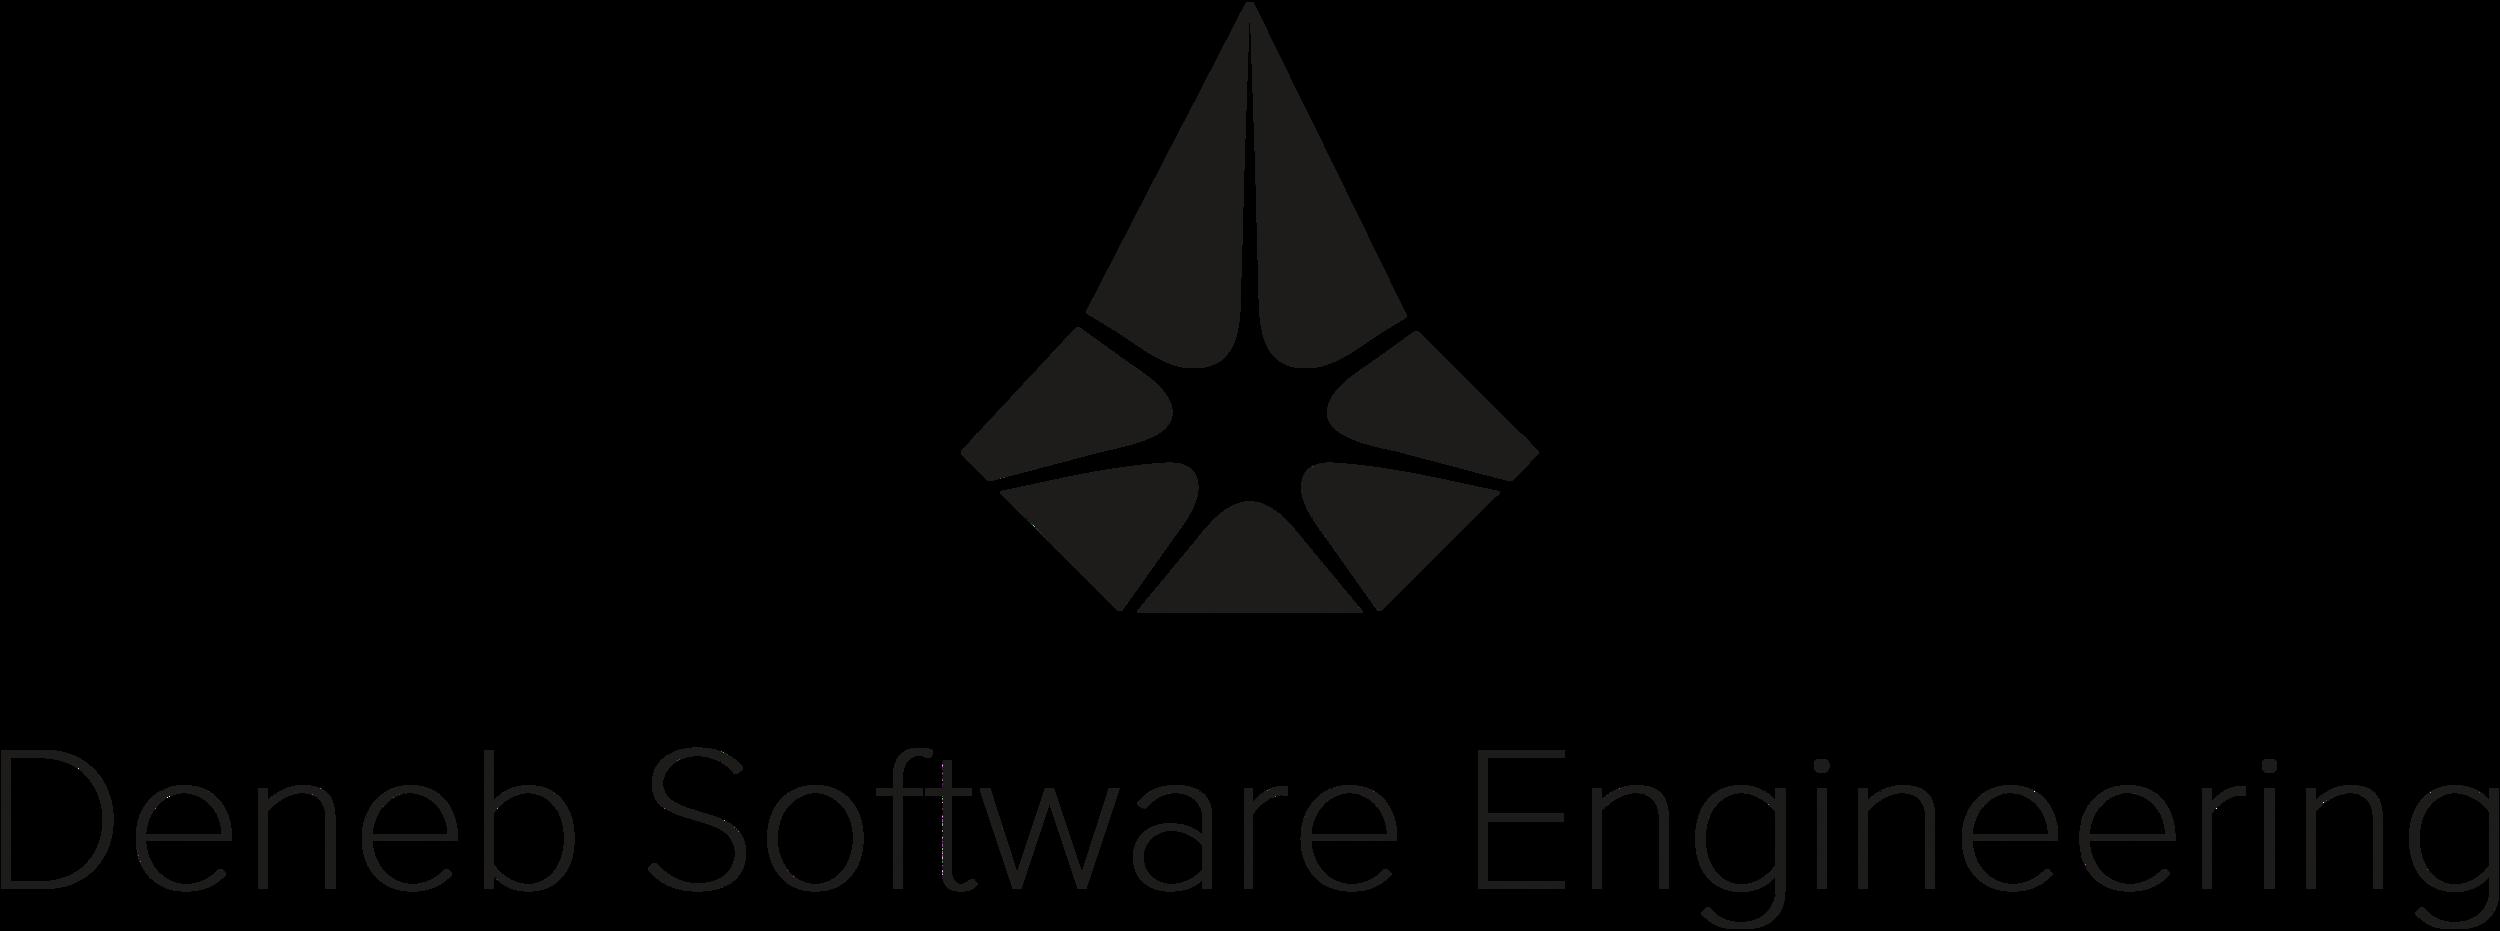 DSE - logotyp - stående (svart)@0,5x.png